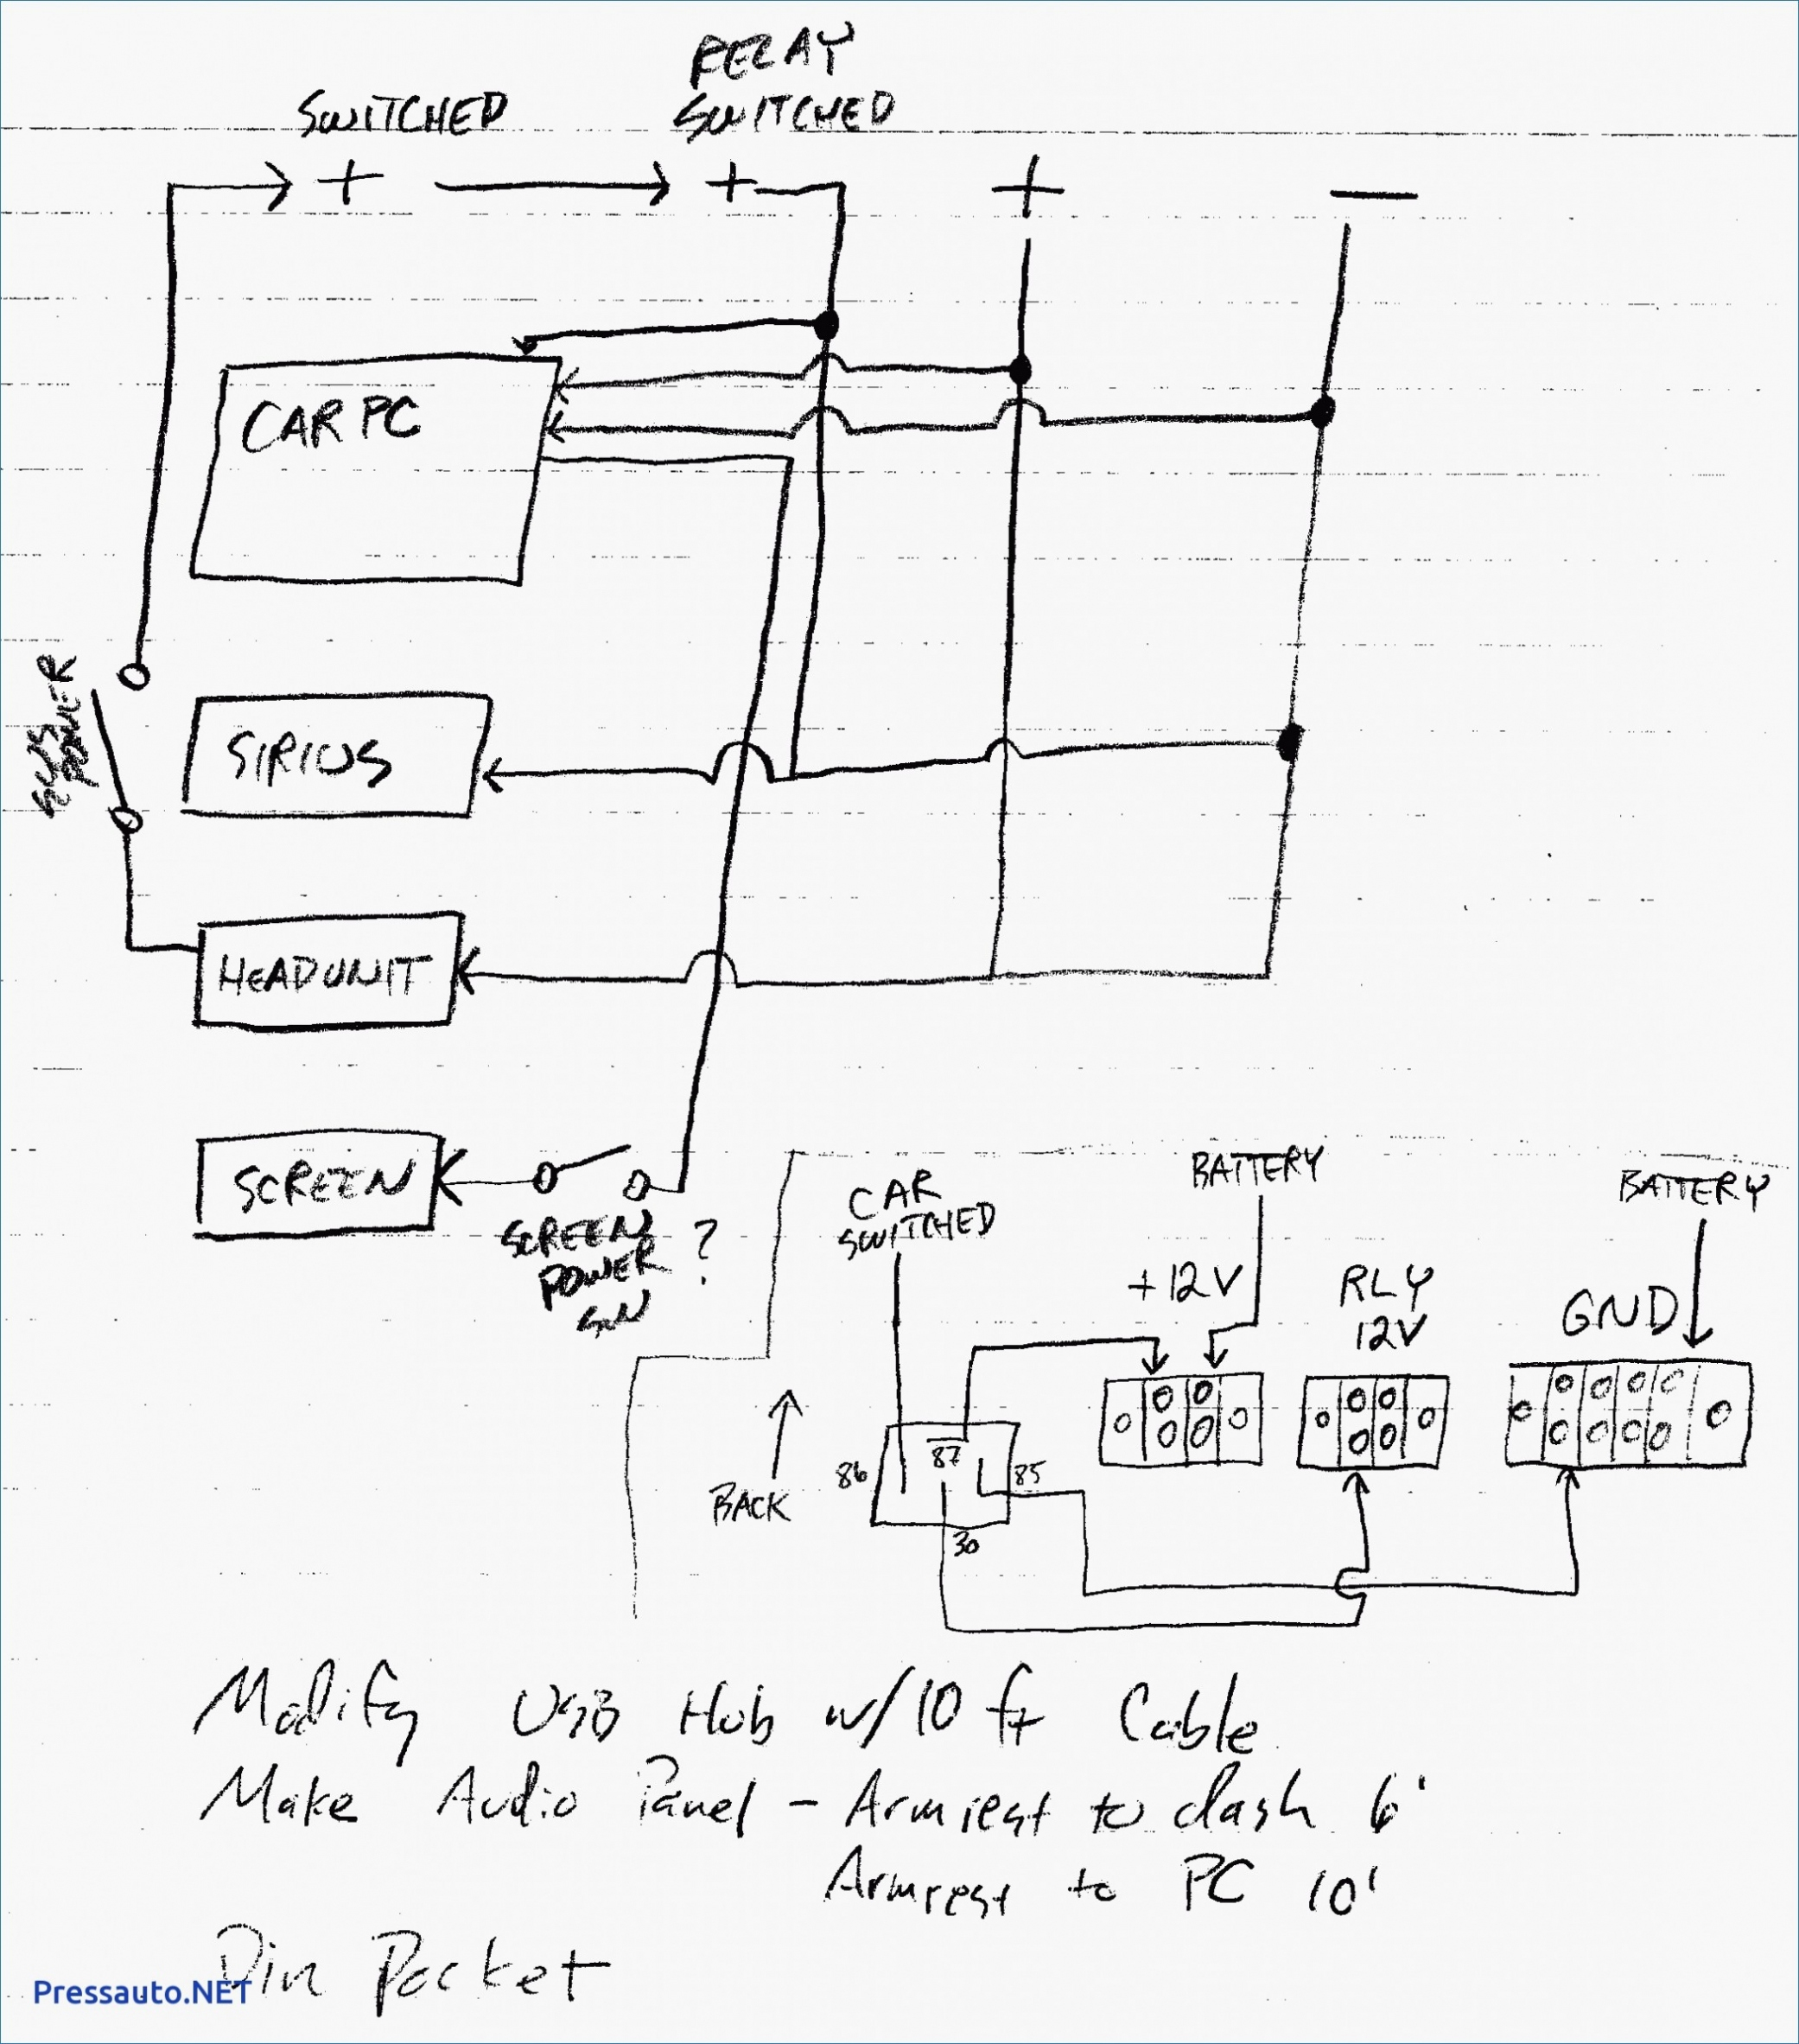 DIAGRAM] Wiring Diagram Meyers FULL Version HD Quality Diagram Meyers -  FT5WIRING.CONCESSIONARIABELOGISENIGALLIA.ITconcessionariabelogisenigallia.it